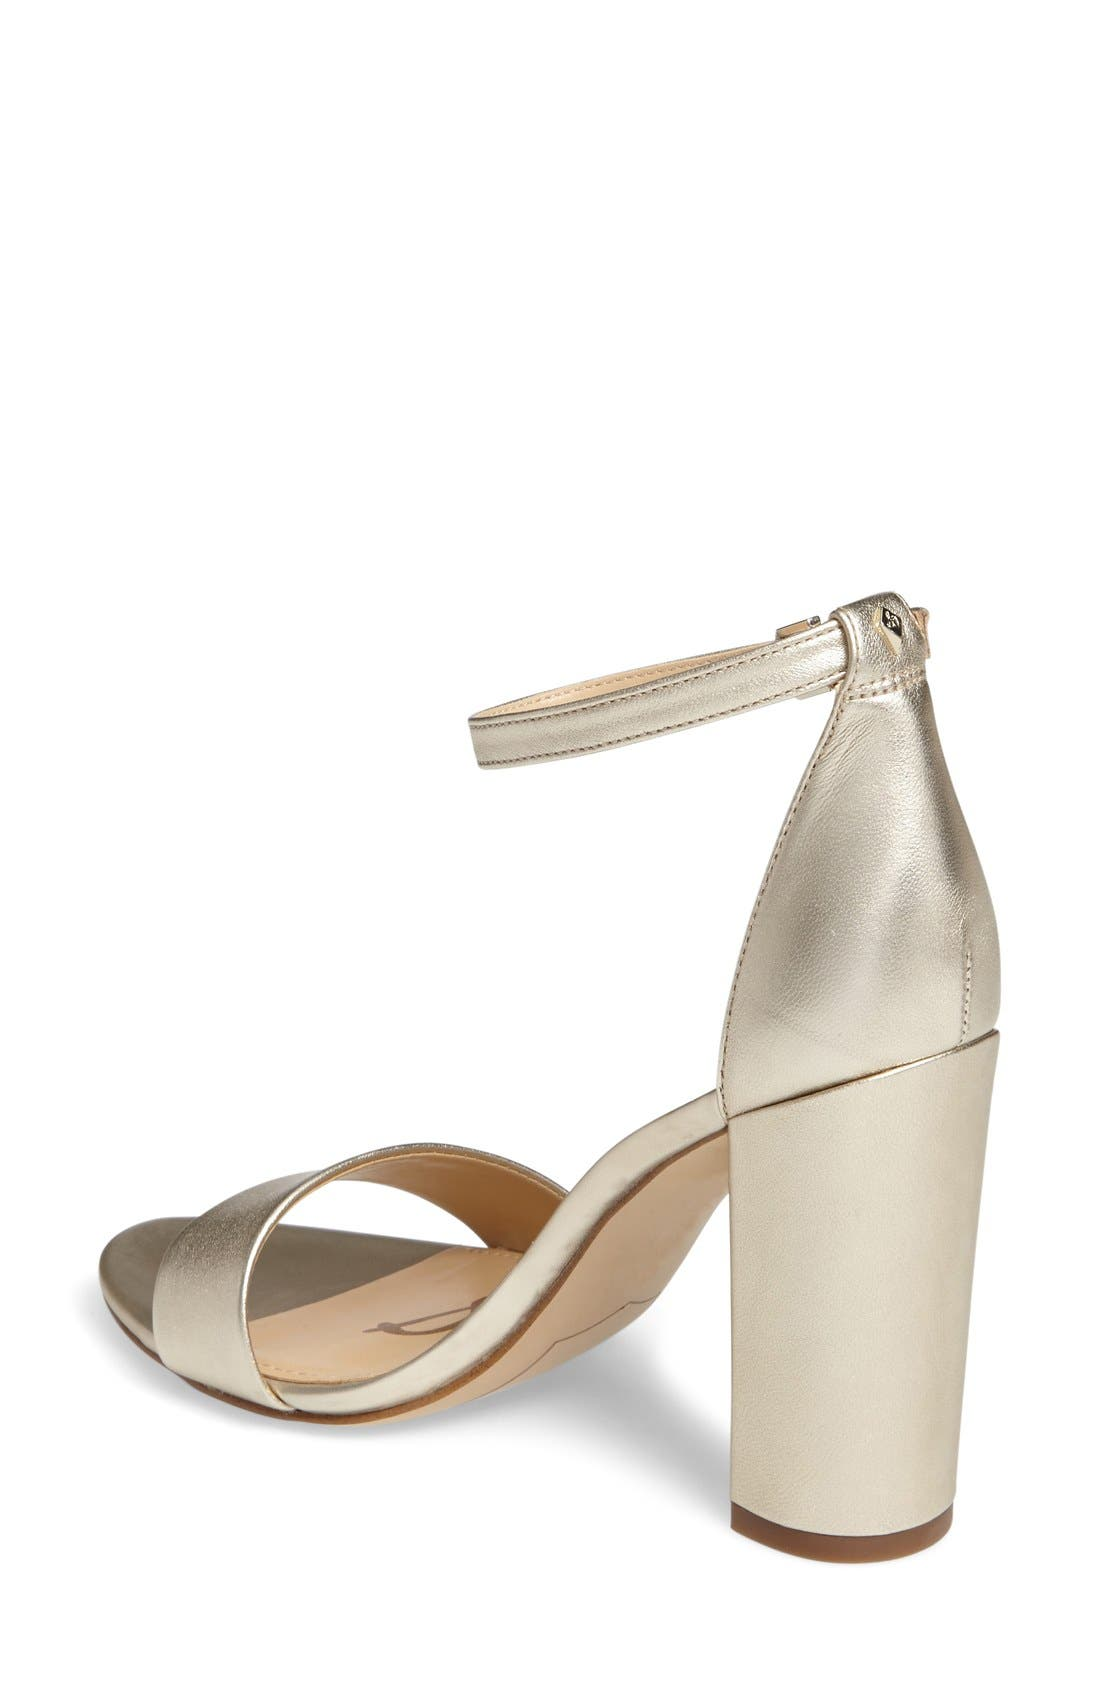 Yaro Ankle Strap Sandal,                             Alternate thumbnail 2, color,                             Jute Leather